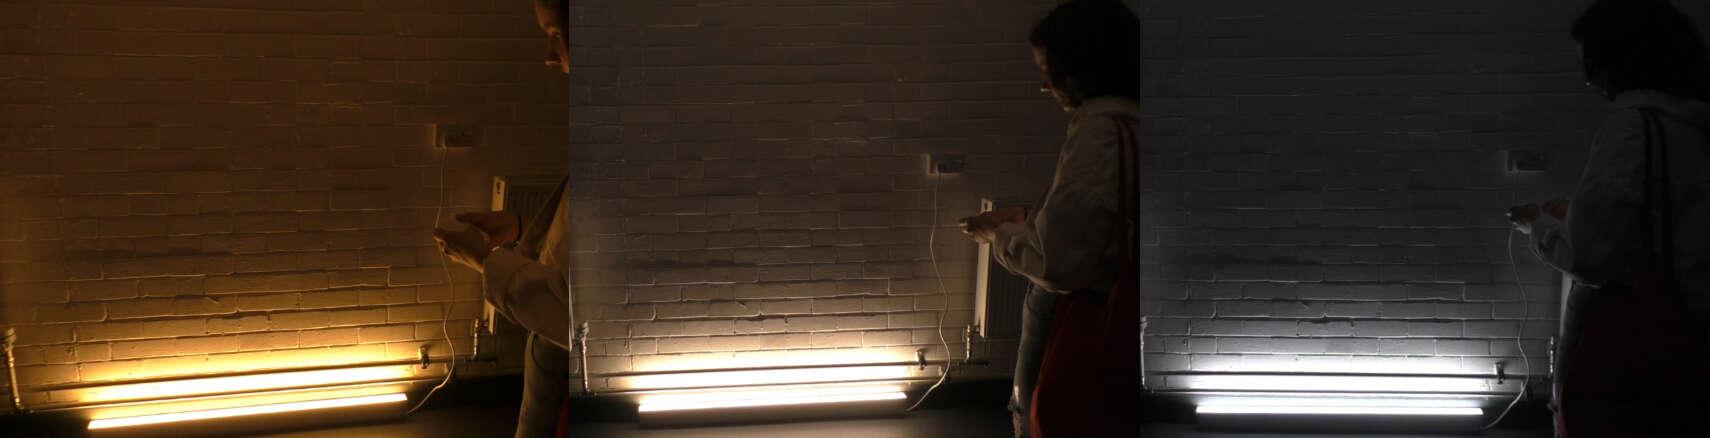 Lighting CCT